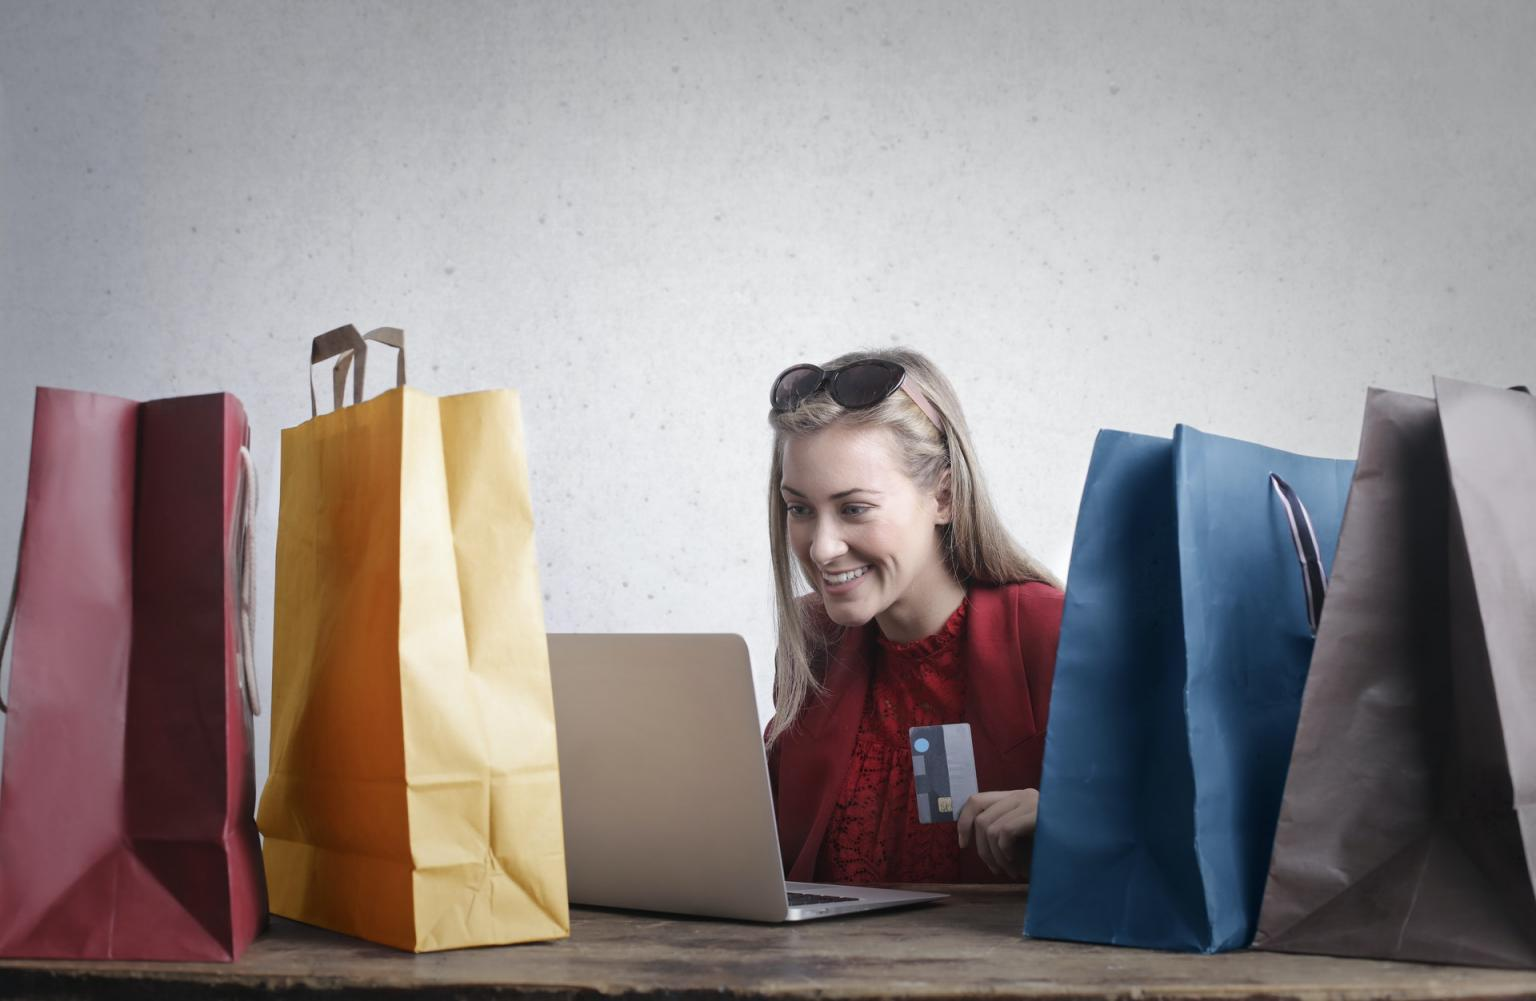 5 dicas para adaptar as vendas na pandemia